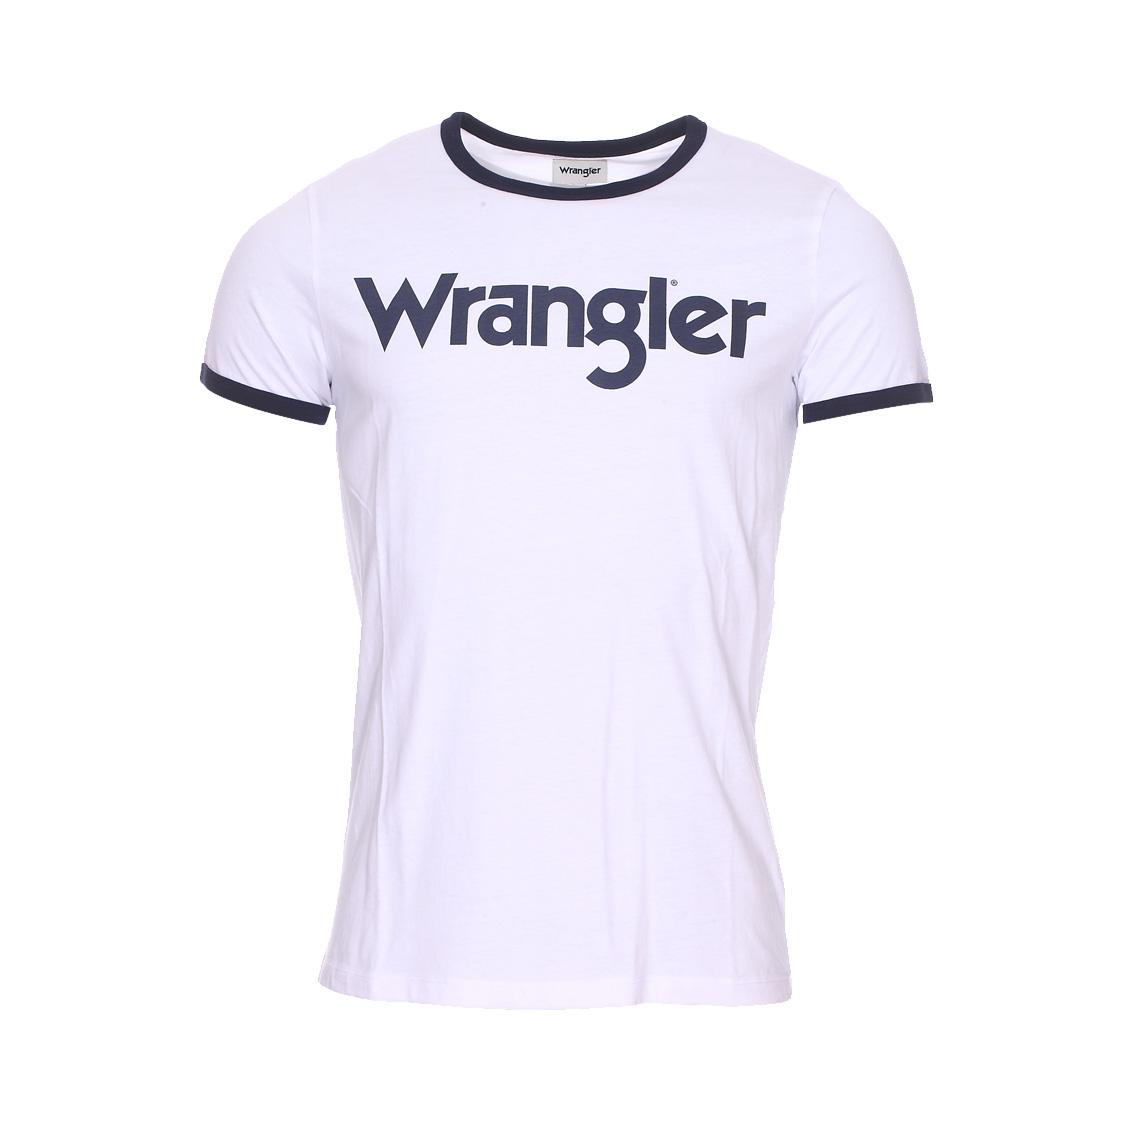 Tee-shirt col rond  kabel en coton blanc floqué en bleu marine